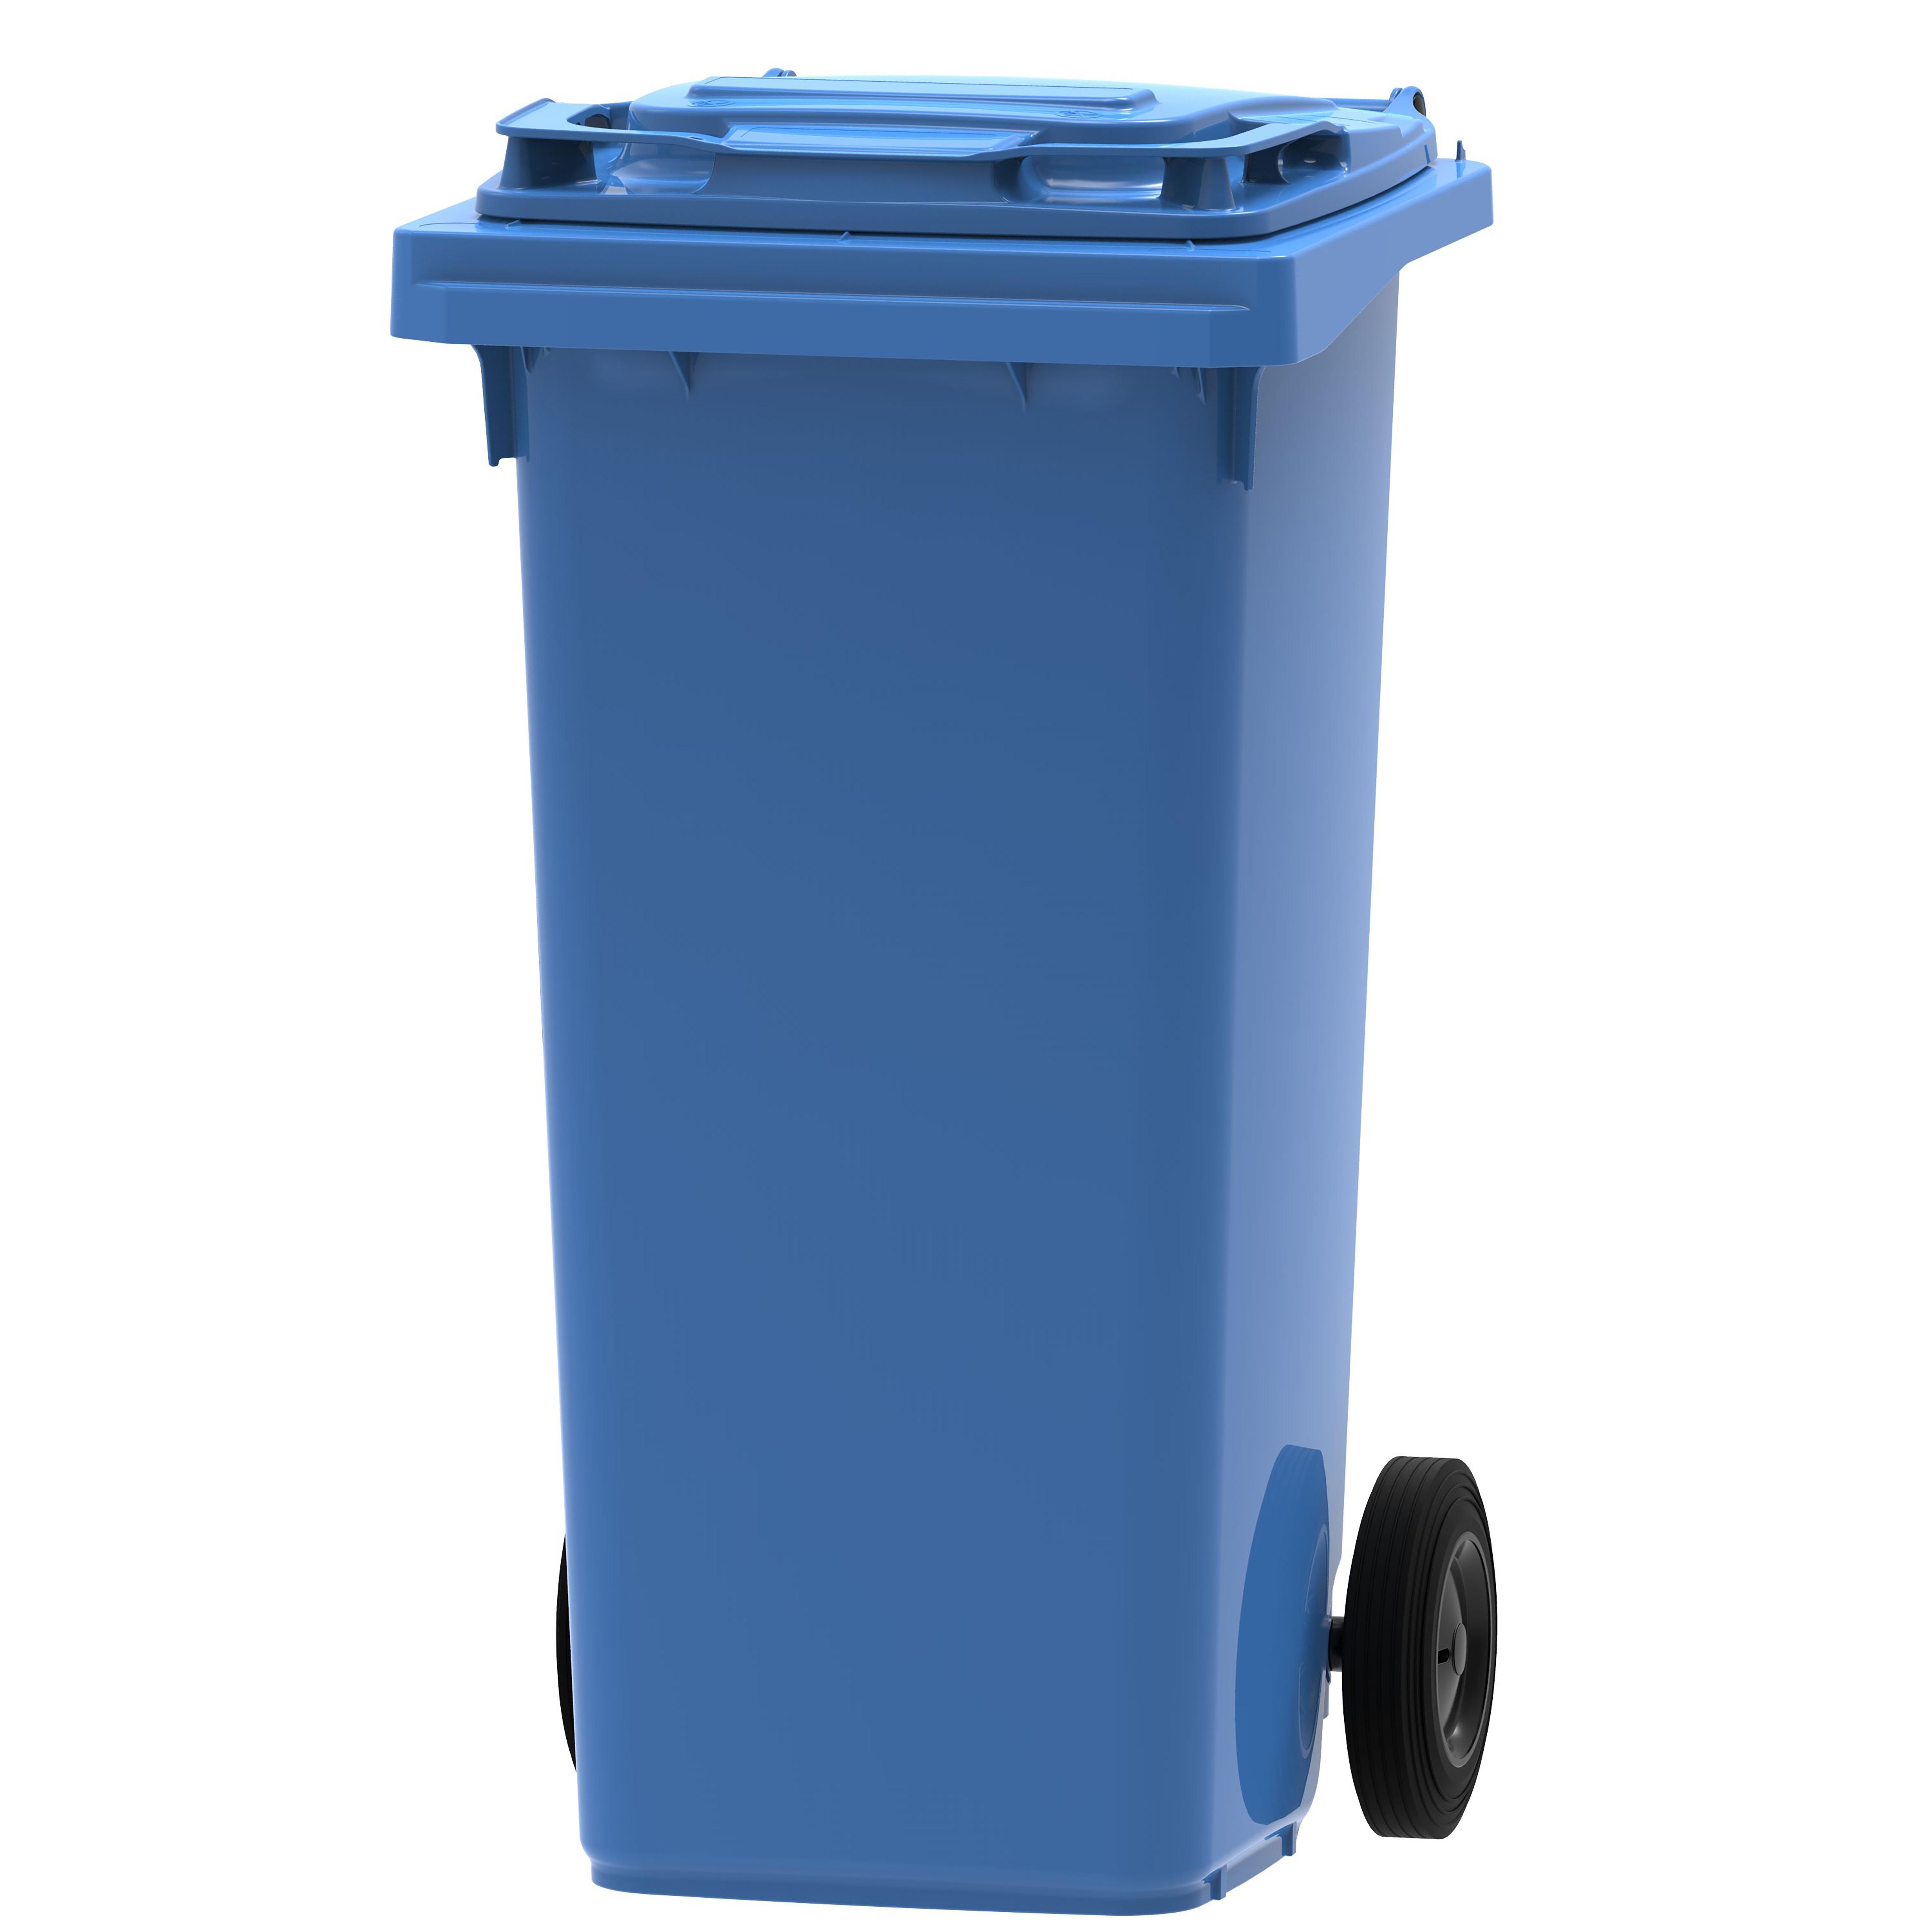 Vepa Bins Mini-container Blauw 120 ltr (VB120000BL2)